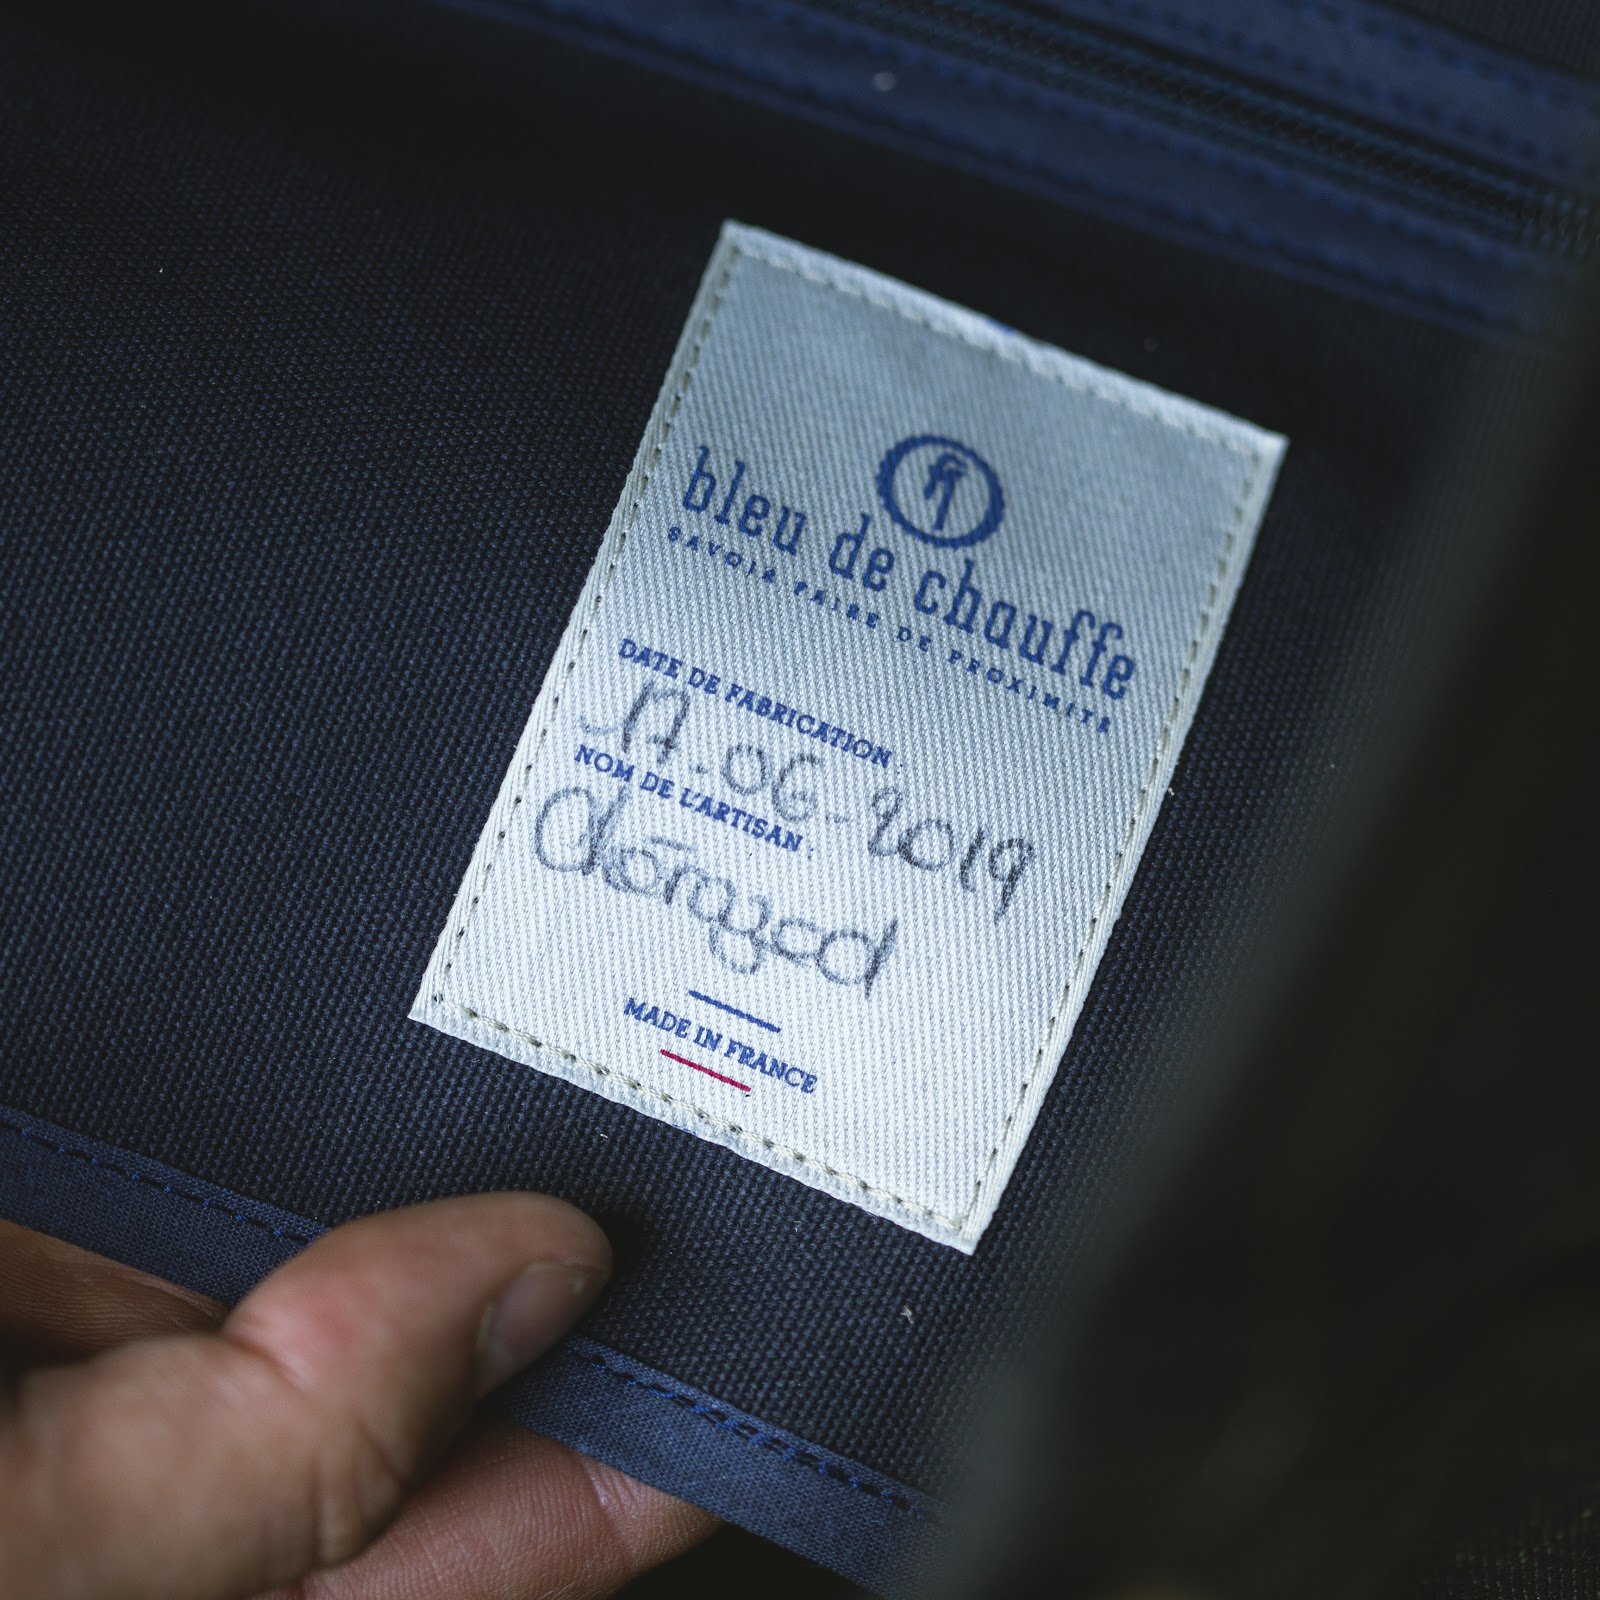 _Tab Bleu De Chauffe 2 featured image